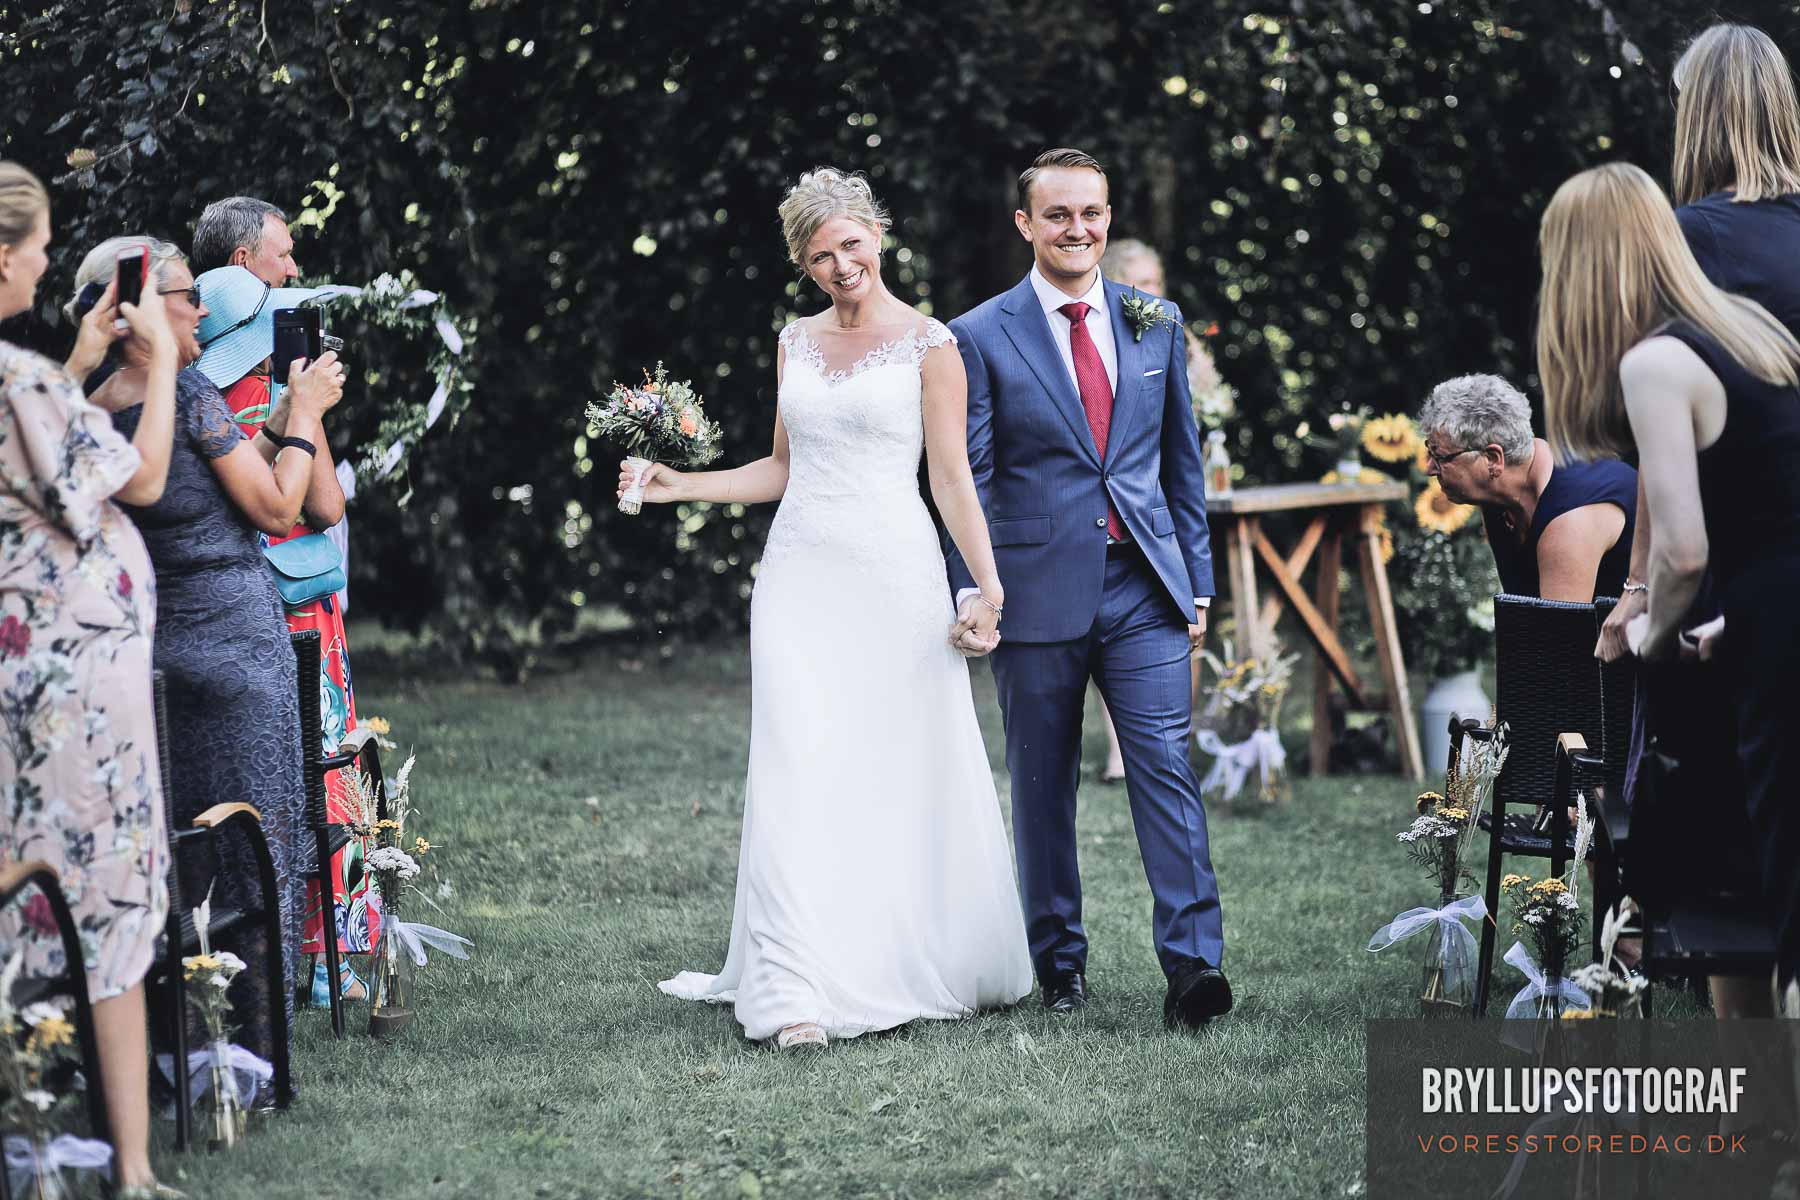 bryllup Jomfrubakken bryllupsfoto